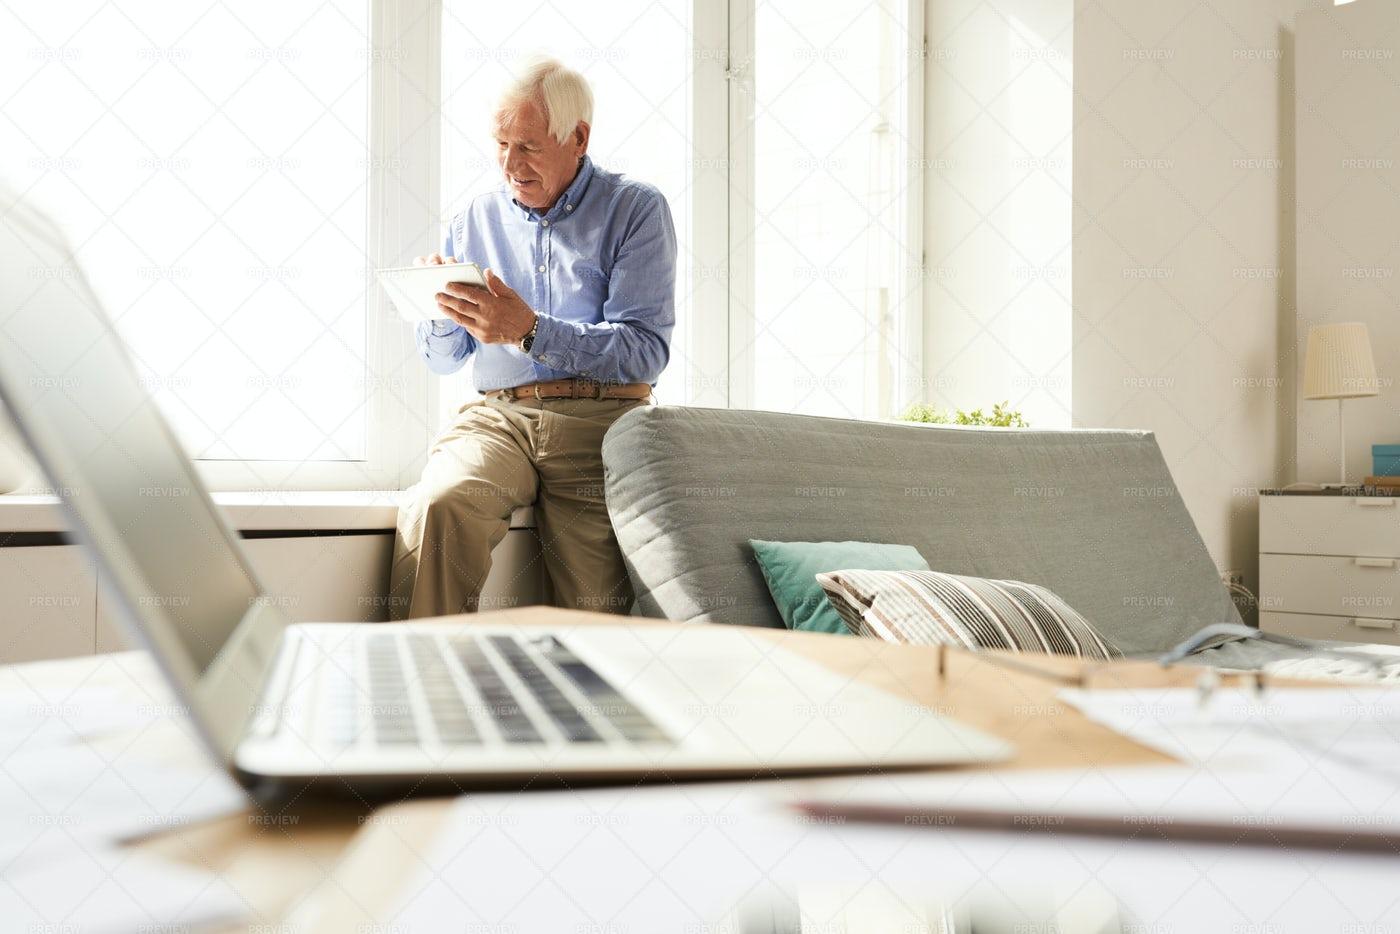 Senior Man At Home: Stock Photos